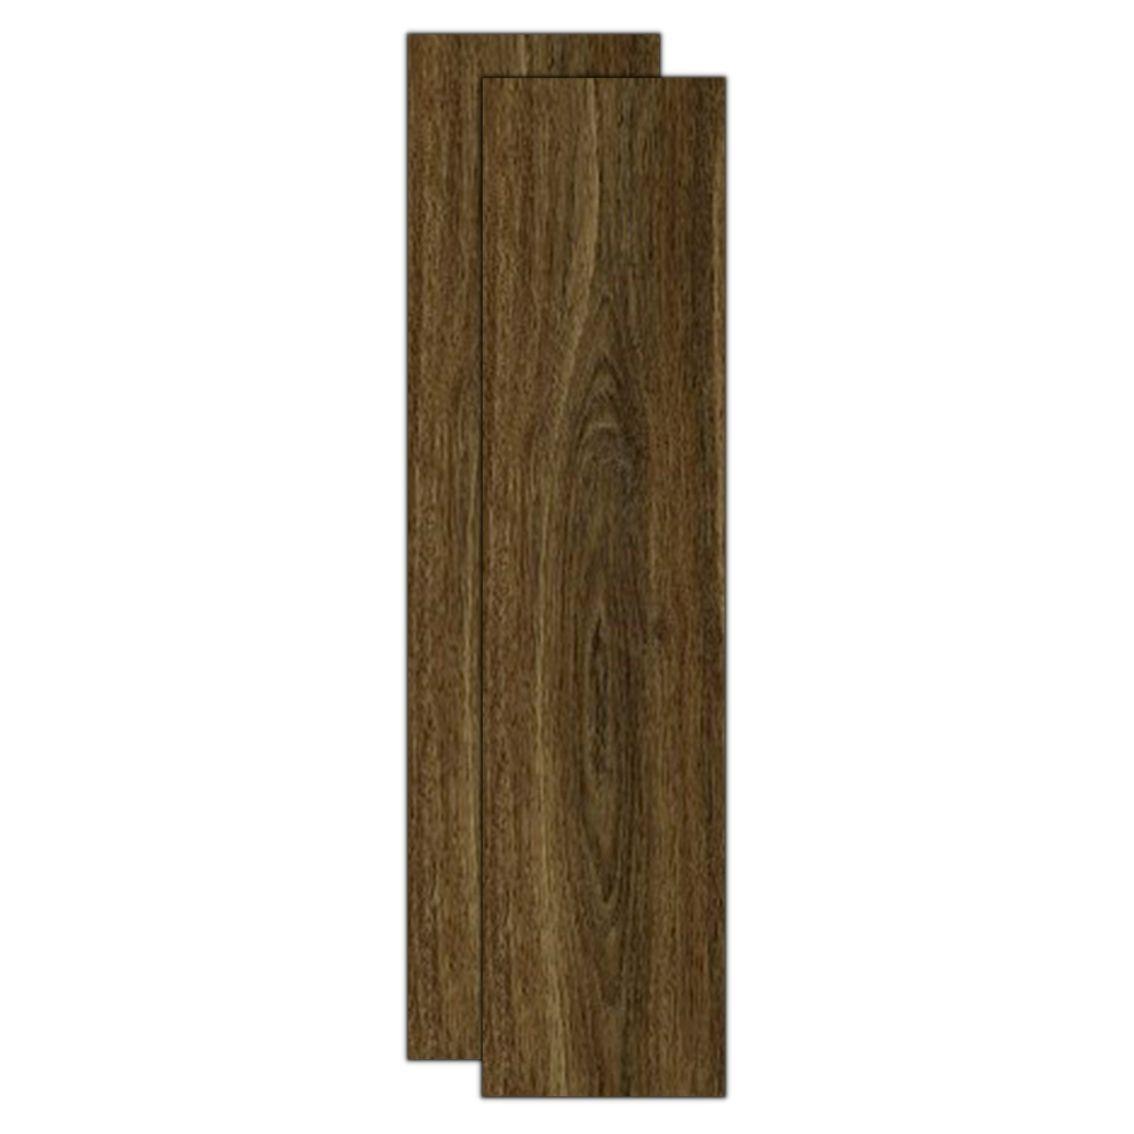 Nuova Monterosso 18x122 cm <br /><b>R$ 219,90 M² </b><br />Cx 2,20 M² <b> R$ 483,78</b>